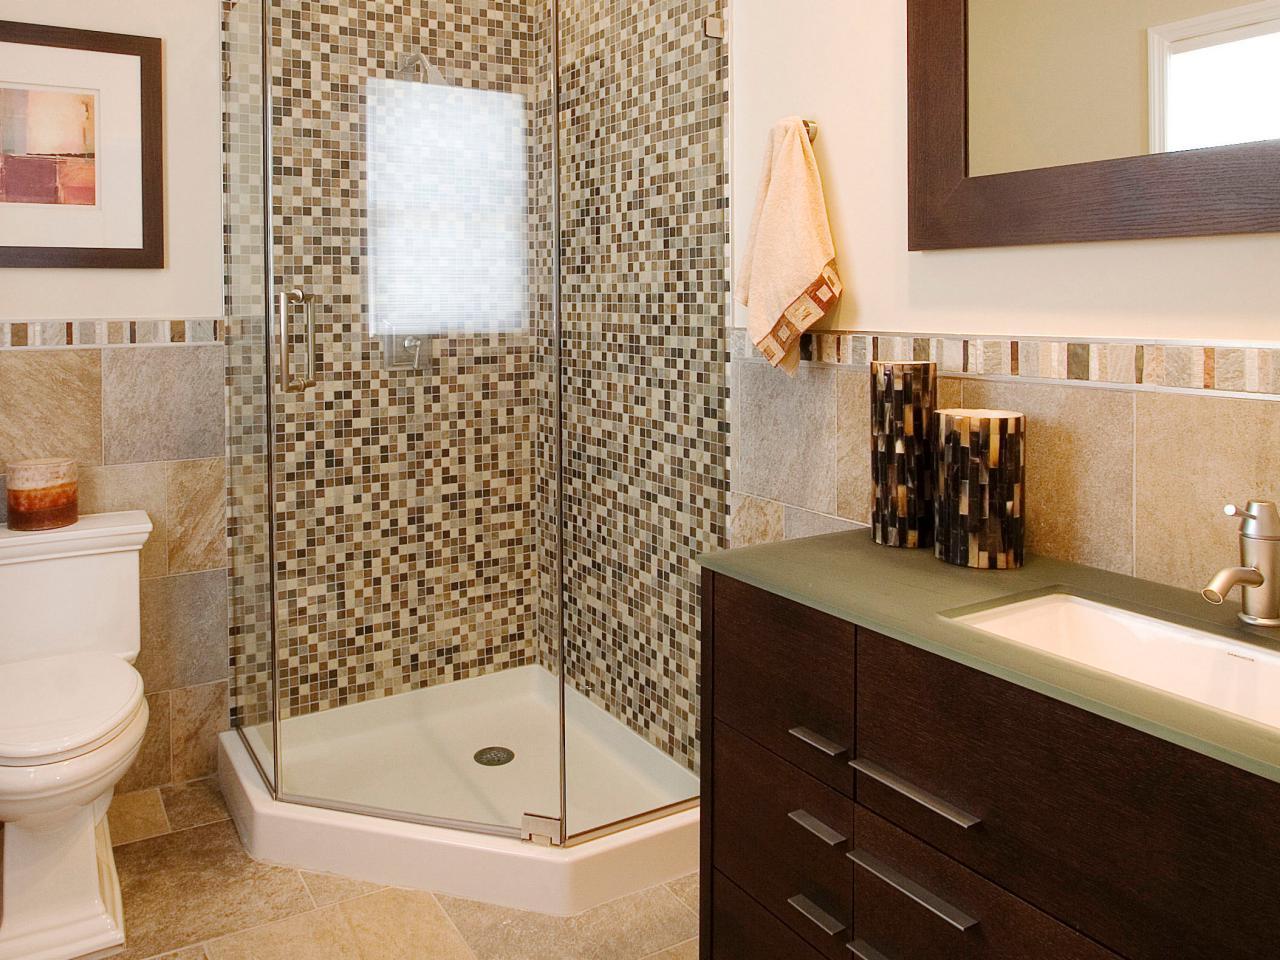 Compact bathroom organization